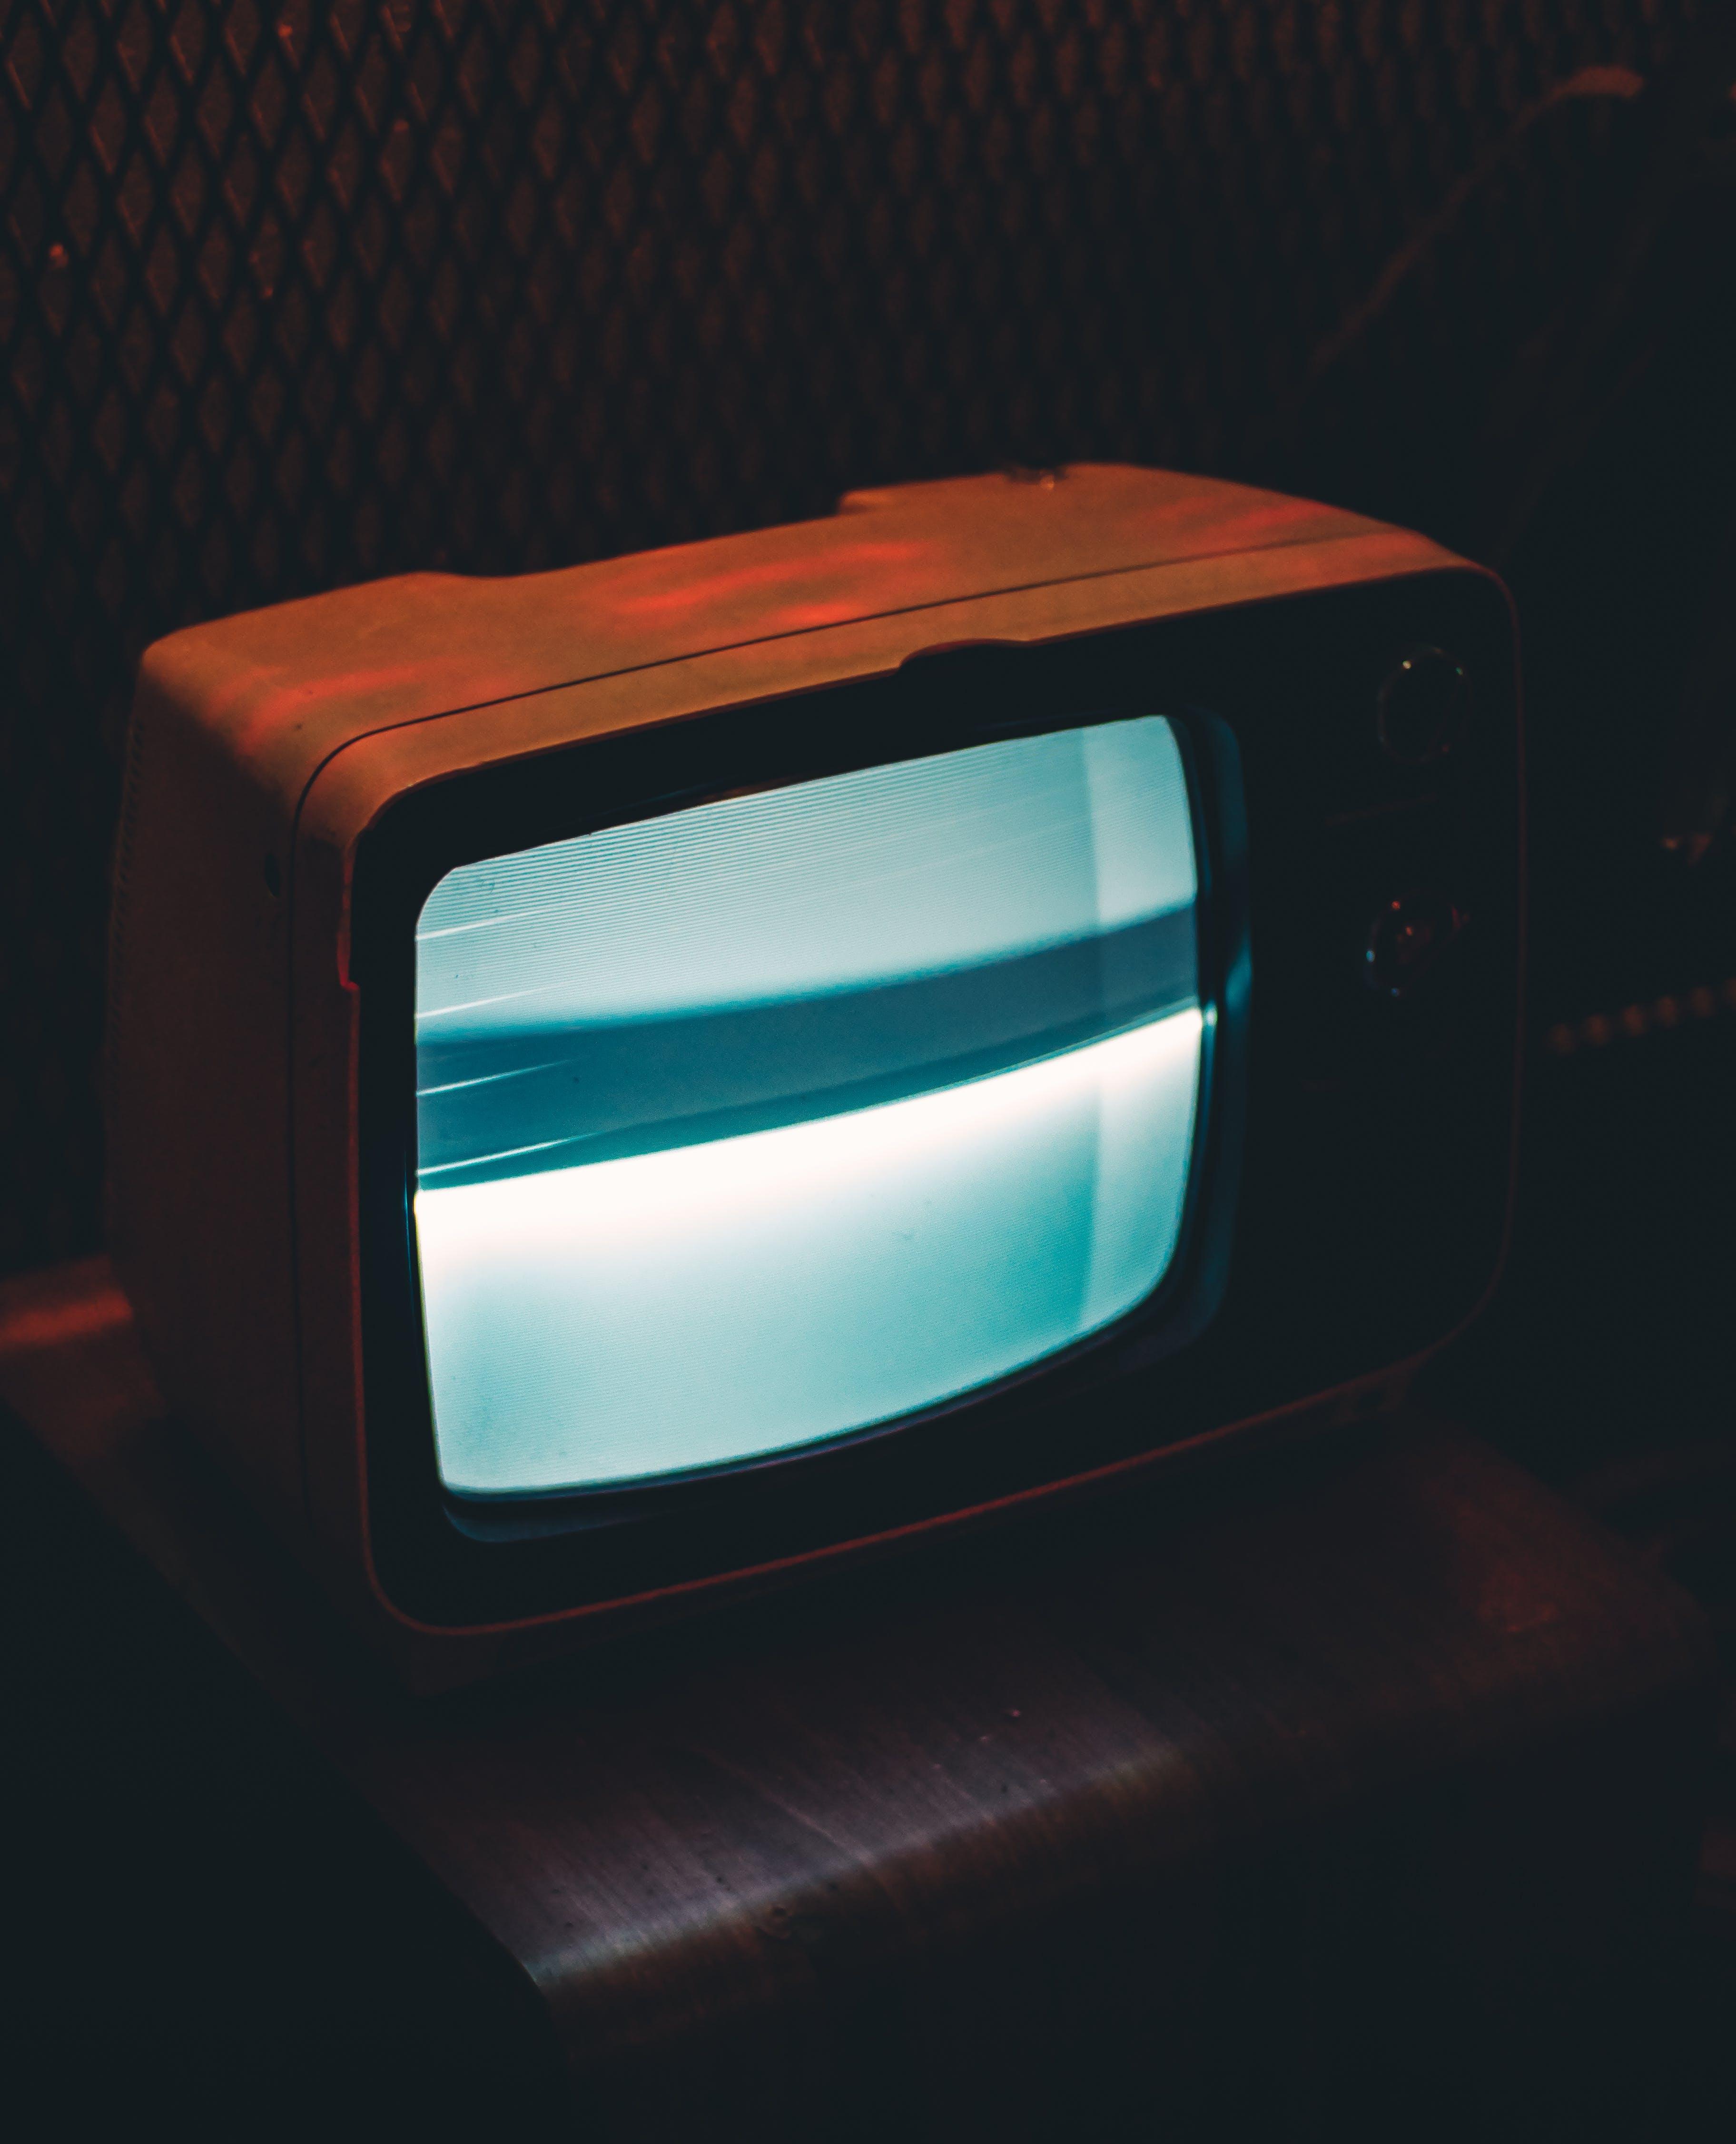 Black Crt Tv Showing Gray Screen